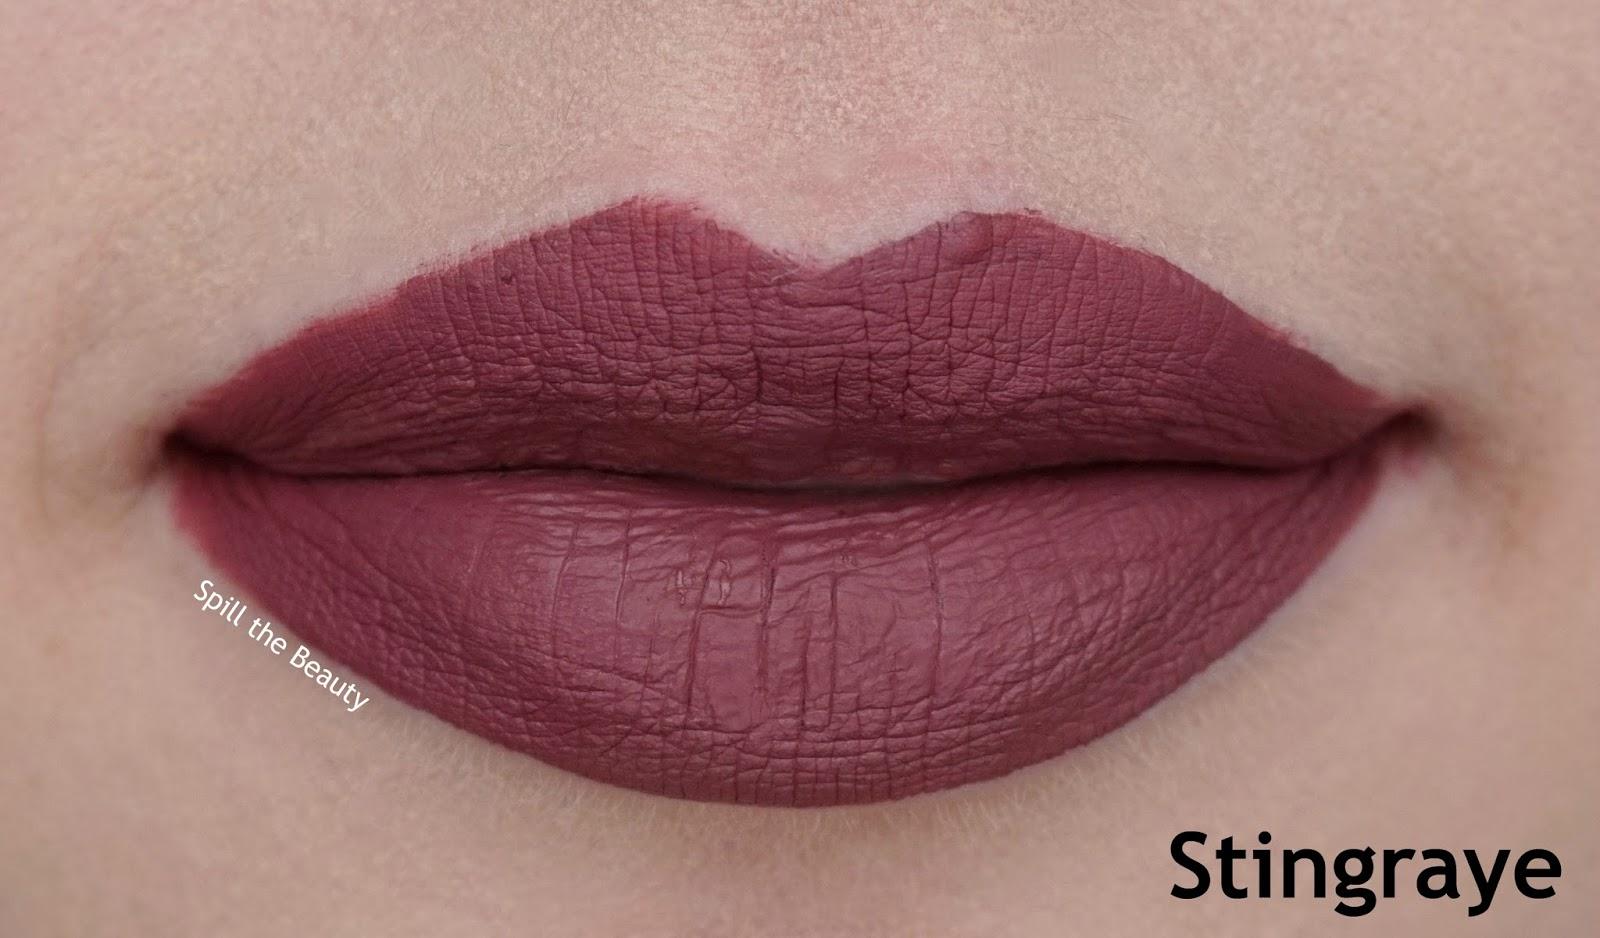 colourpop ultra matte lip review swatches 5 stingraye - lips